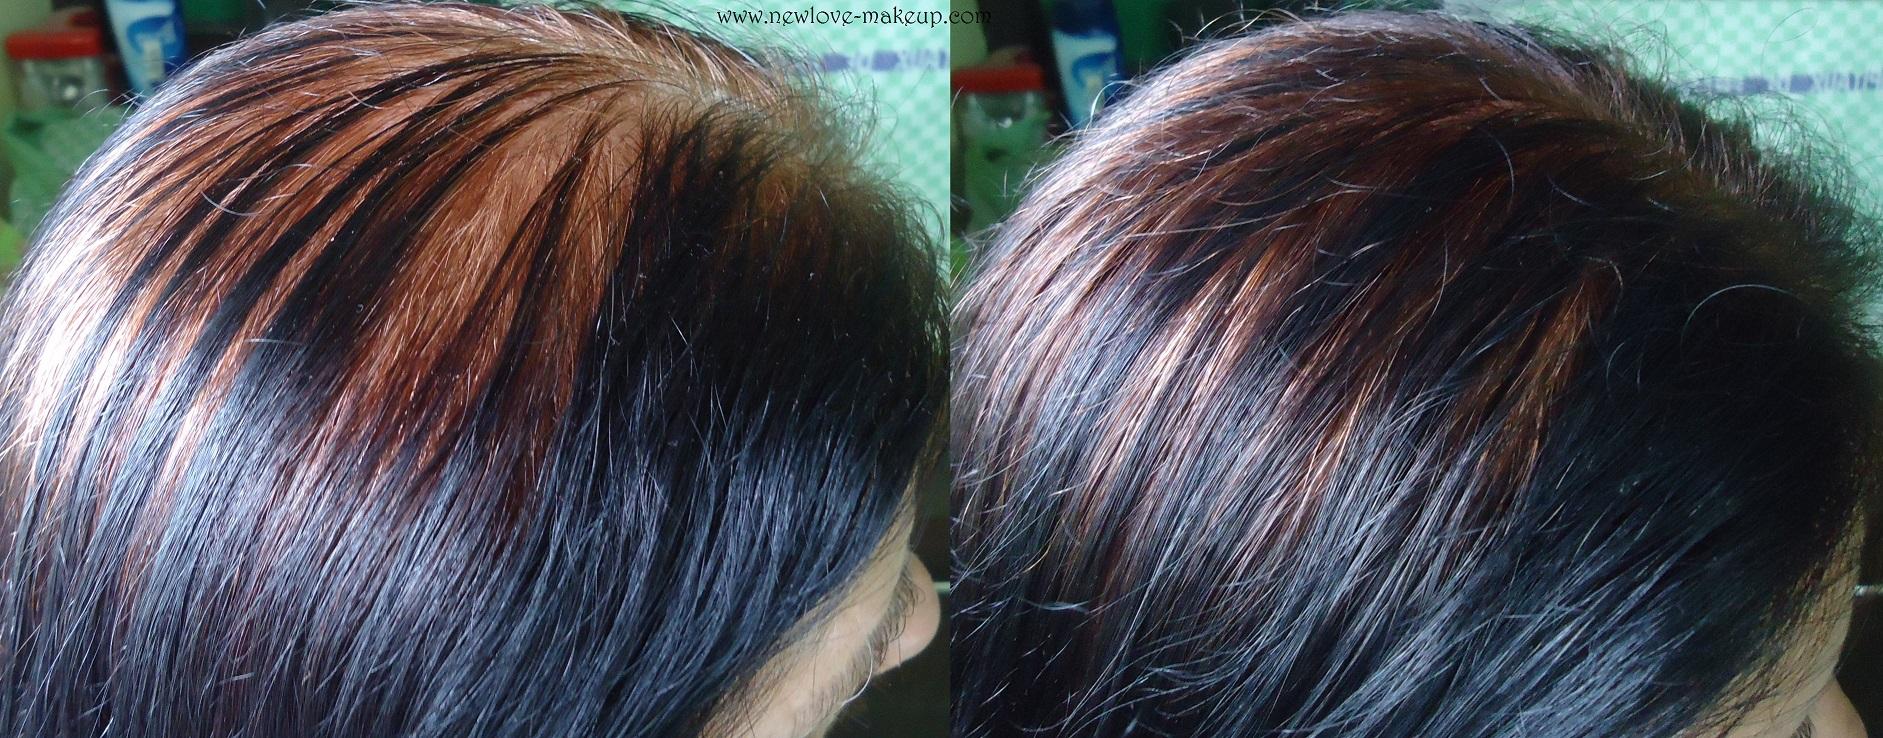 Godrej Nupur Coconut Henna Creme Colour Review Demo New Love Makeup